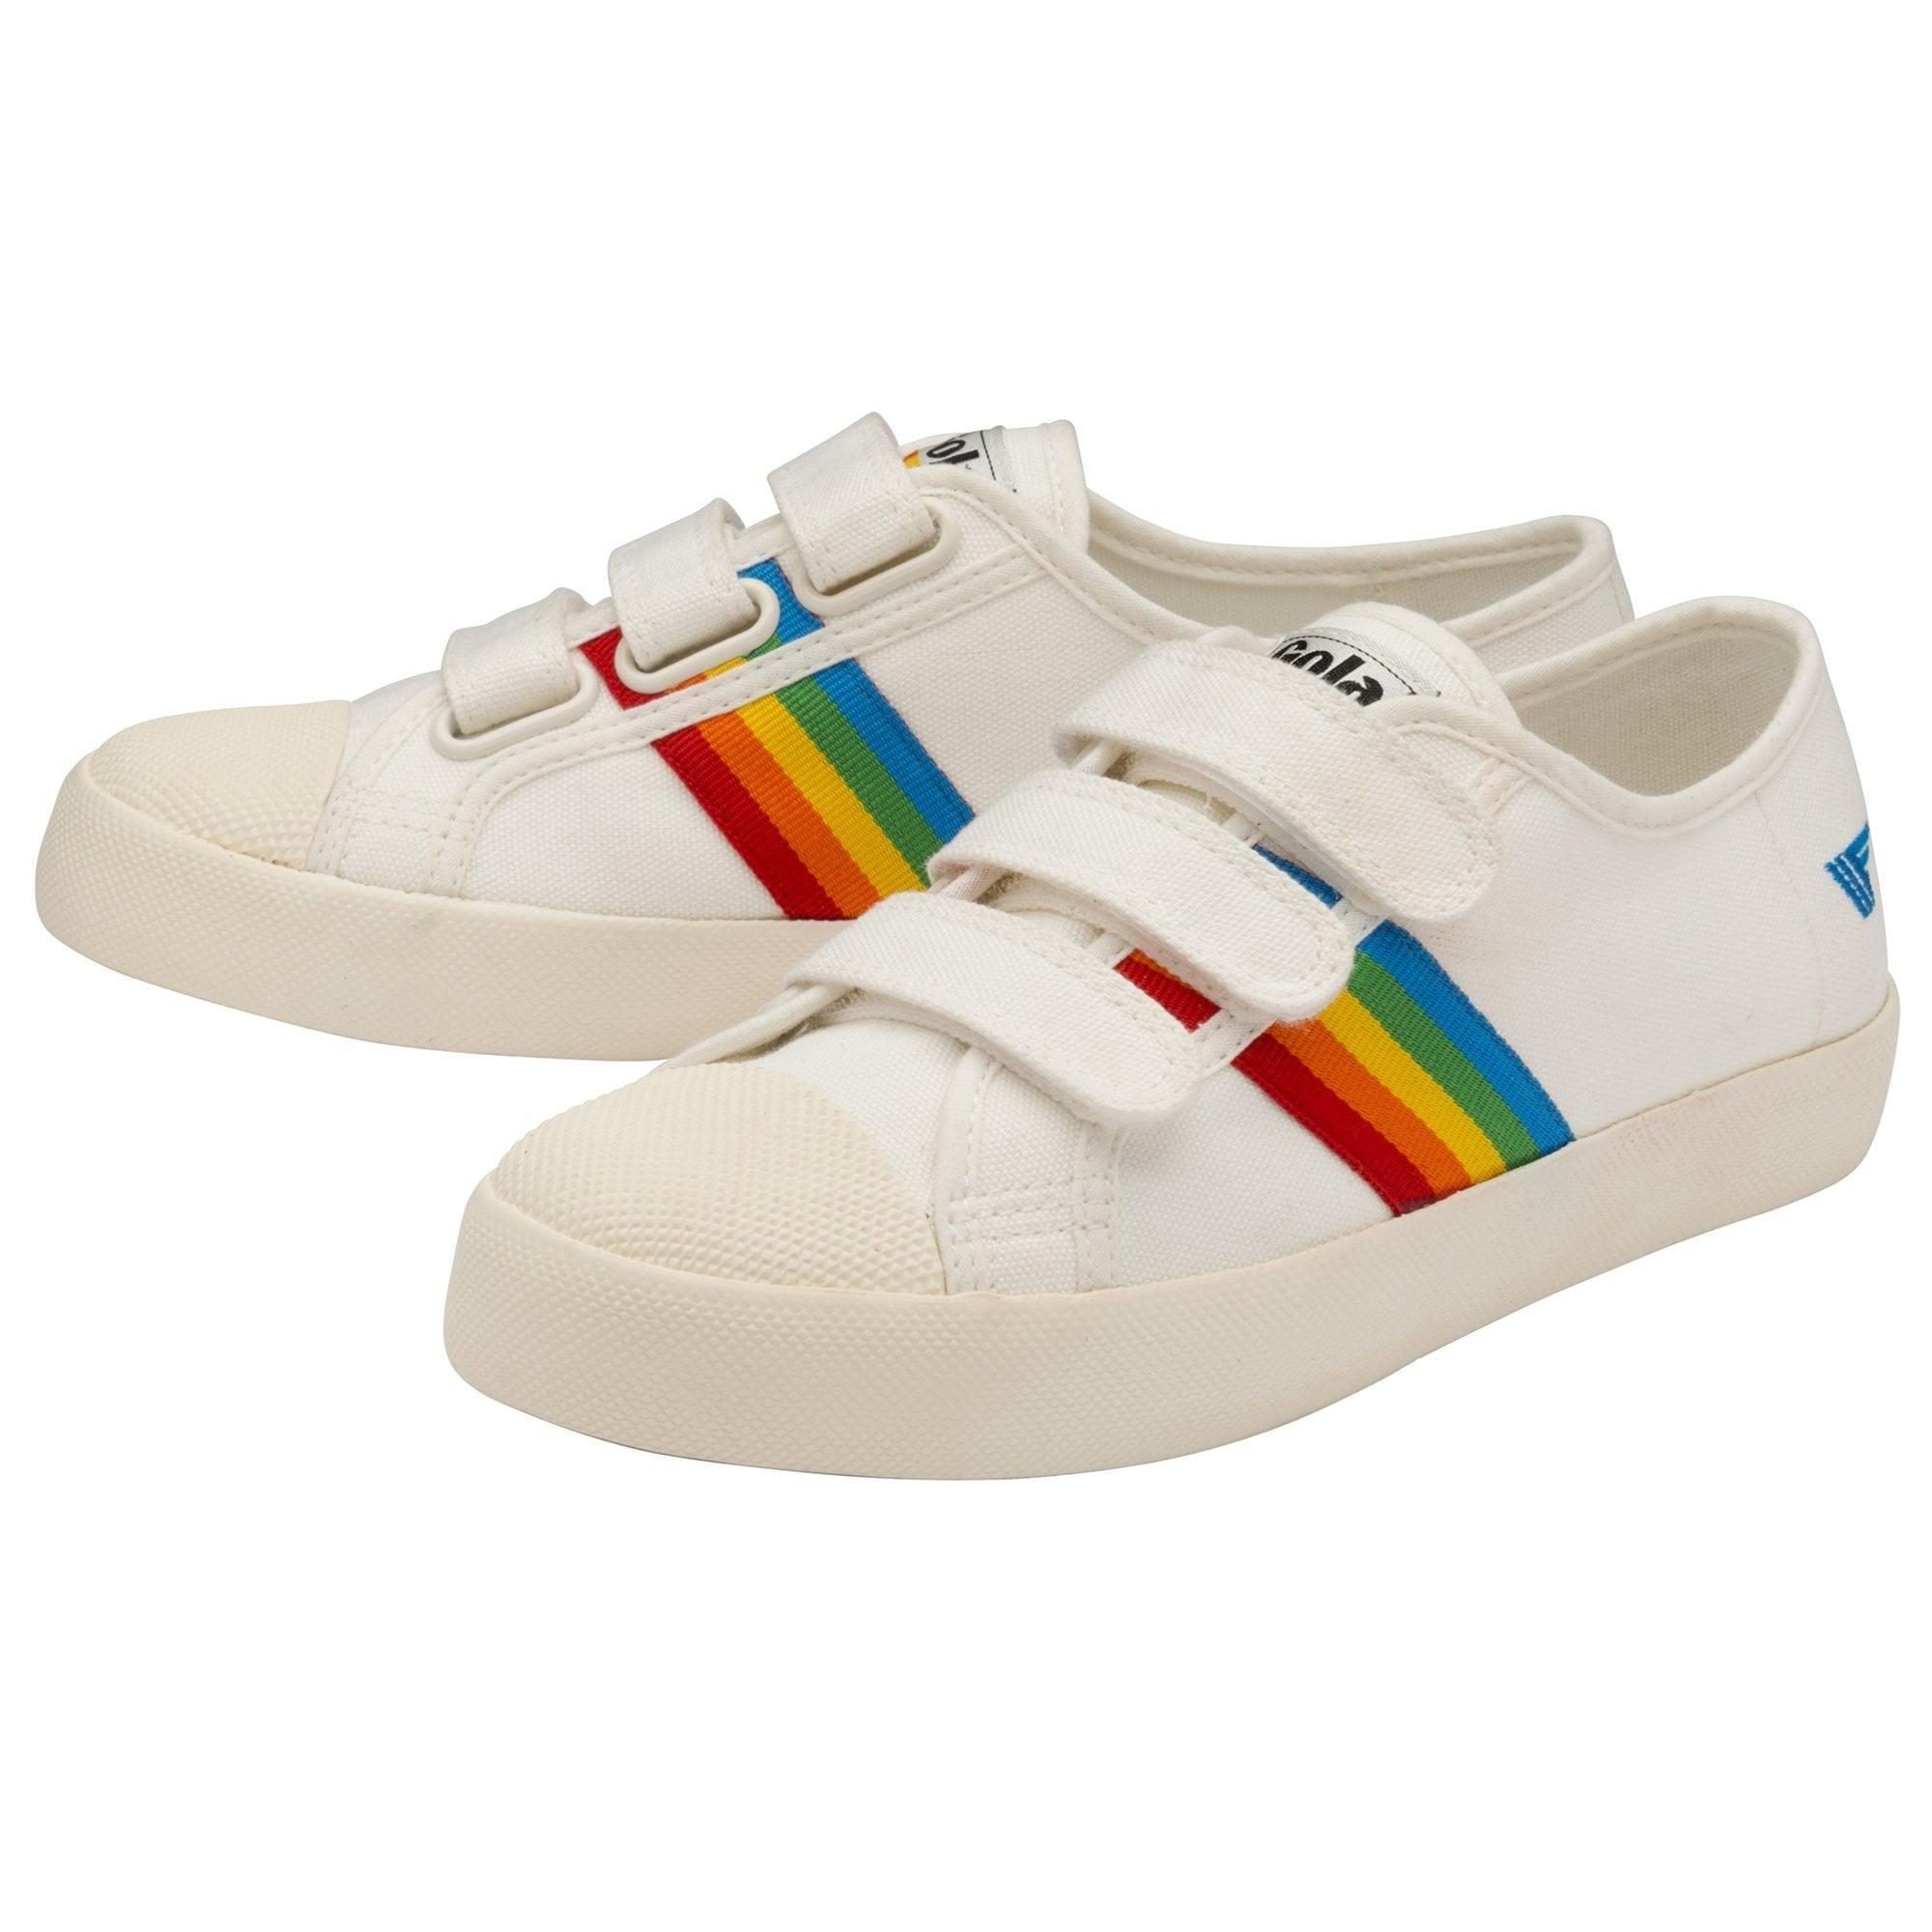 Buy Gola womens Coaster Rainbow Strap